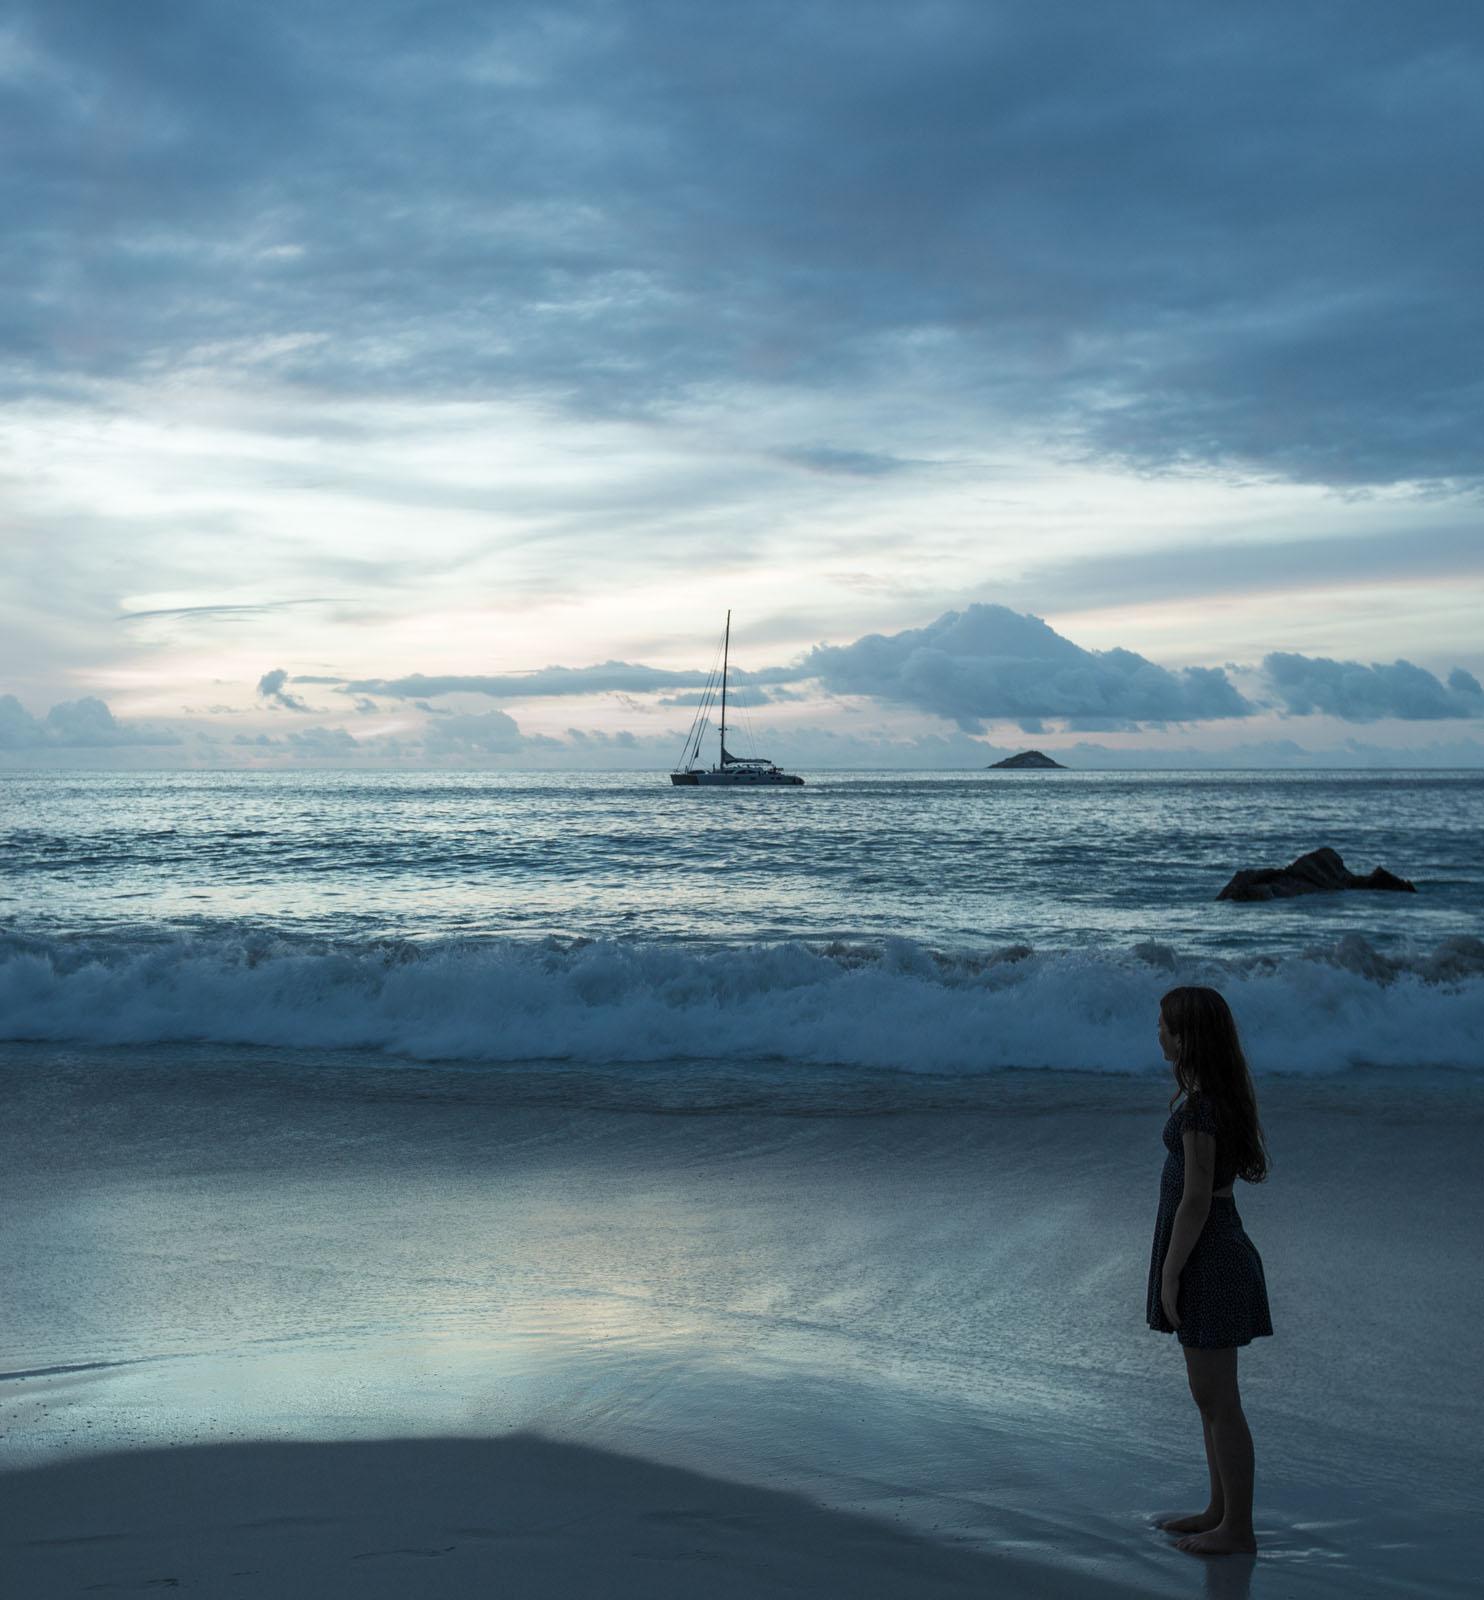 dusk at the evocative Lazio Beach